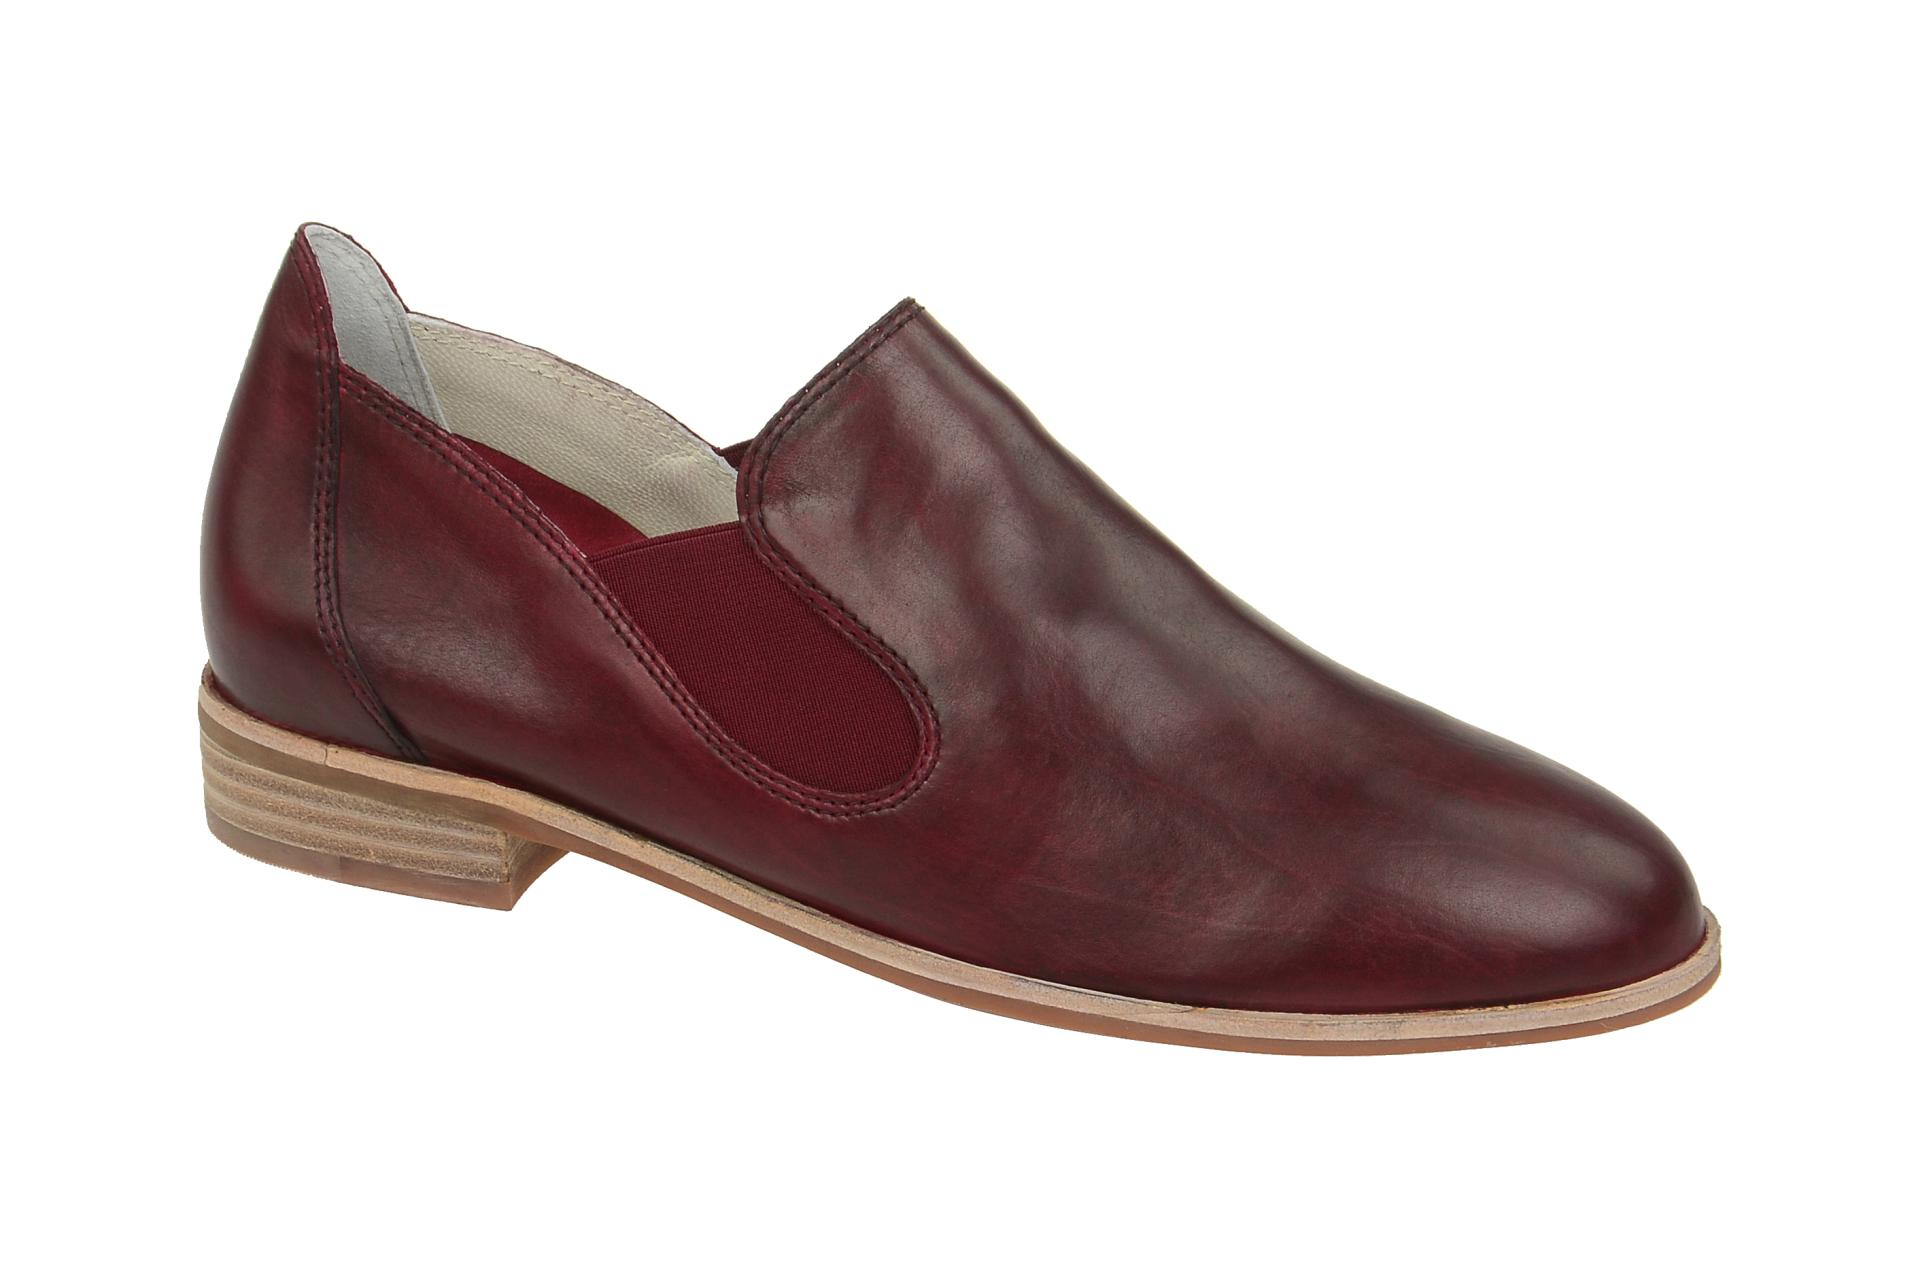 the latest 677c9 91d1b Details zu Everybody Schuhe 30504G2365 rot Damenschuhe elegante Slipper  30504G2365 sangria